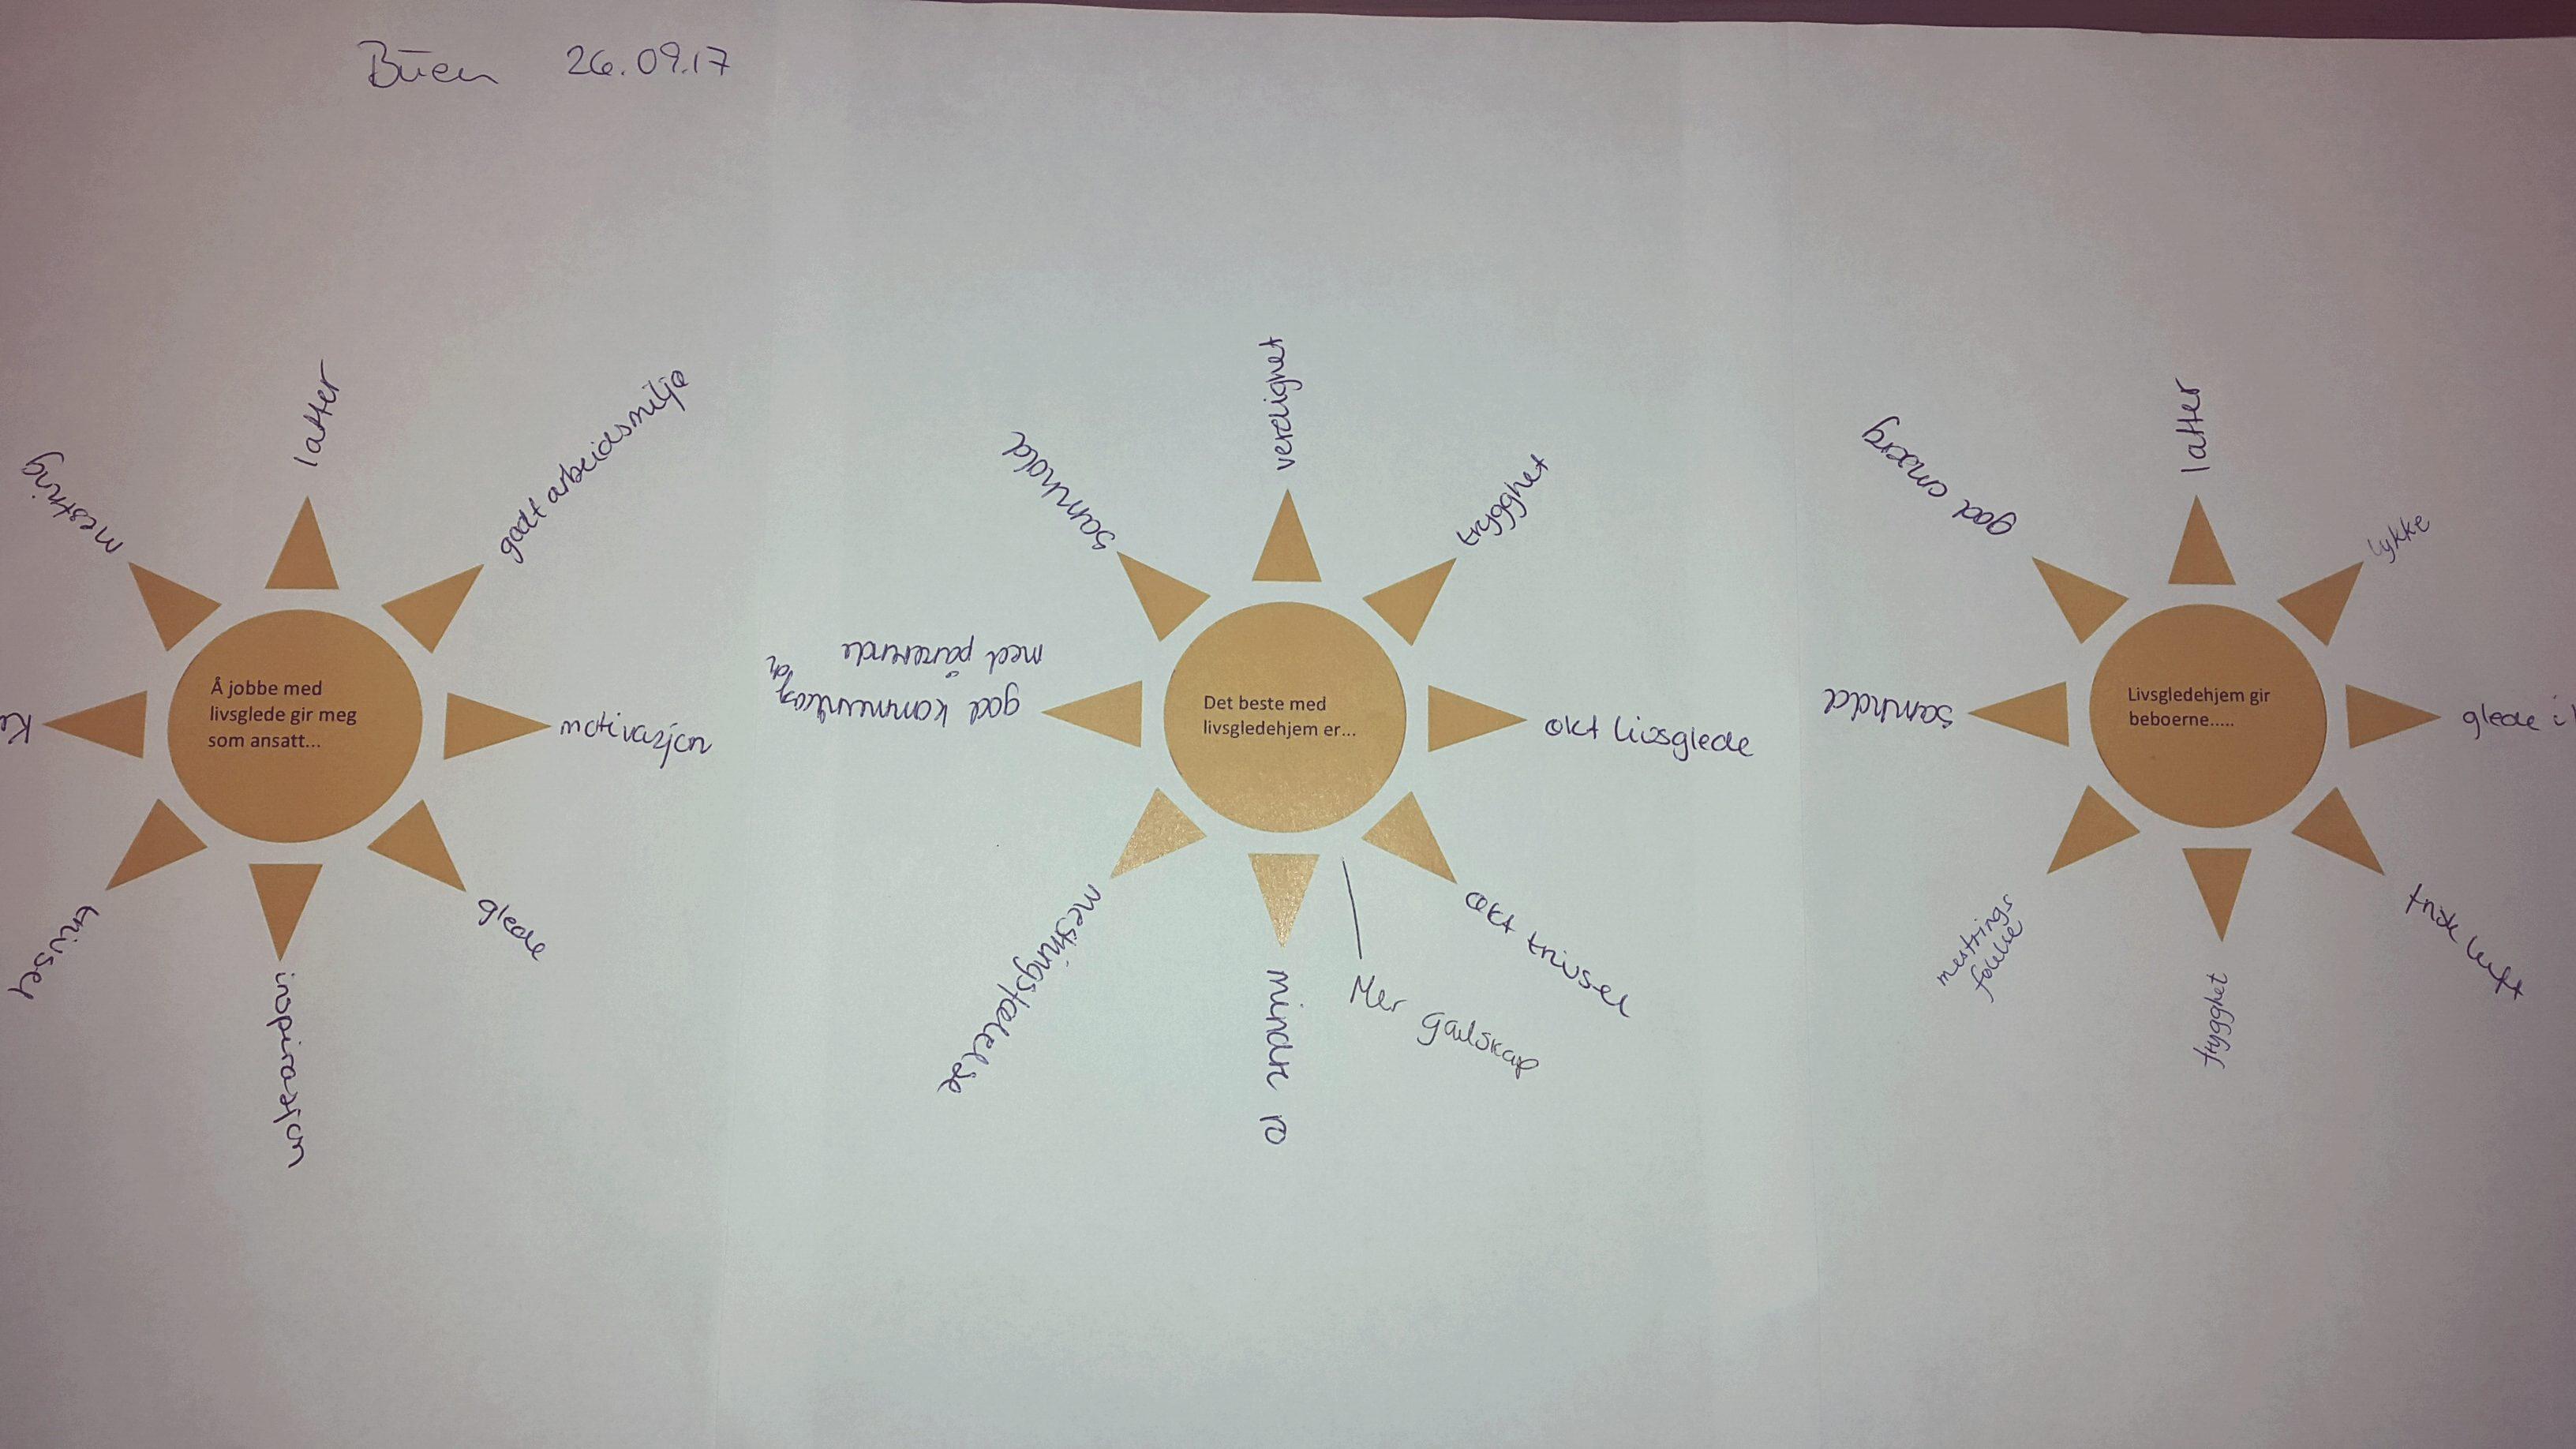 Pedagogisk sol fra Buen forteller om økt mestring, trivsel, glede både for ansatte og beboere.